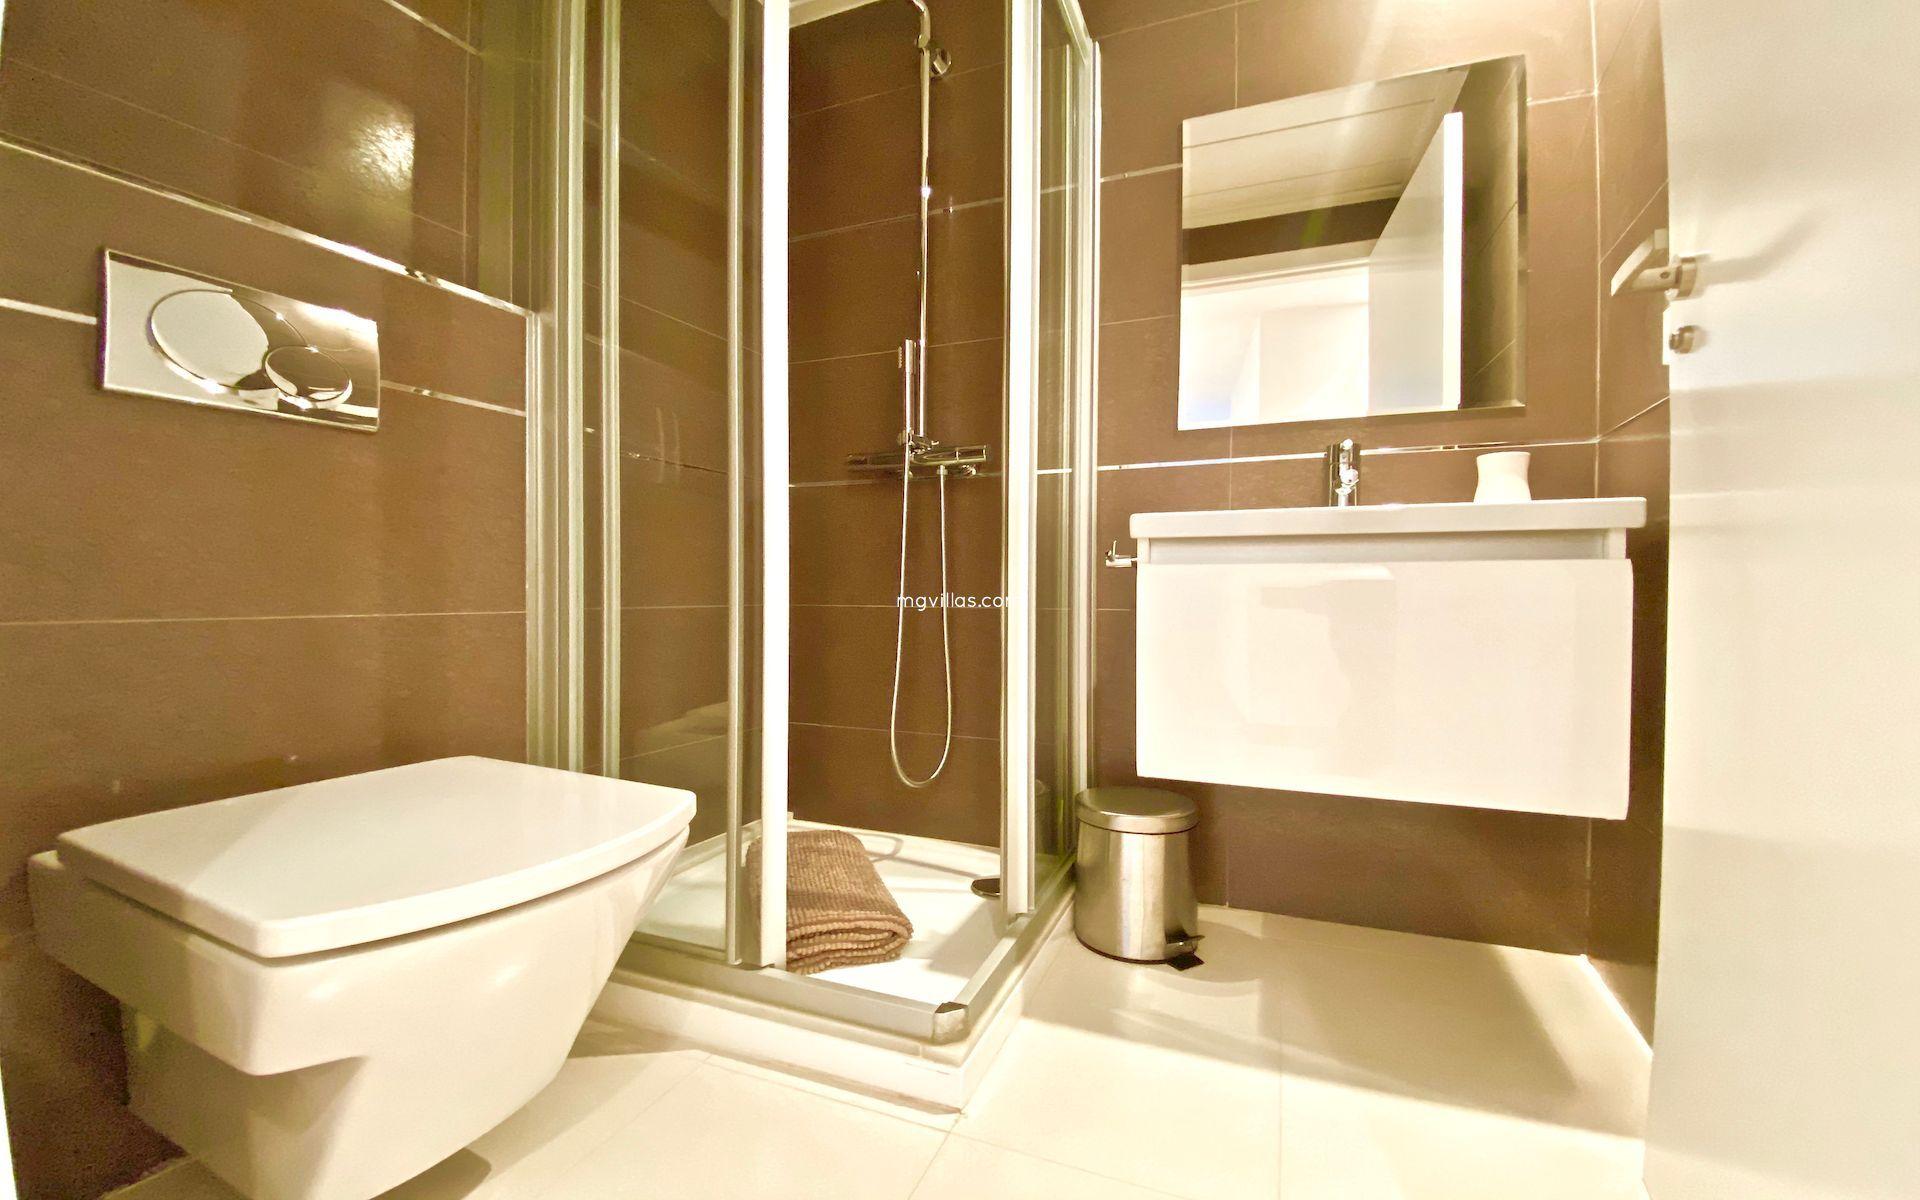 4 Schlafzimmer Duplex Penthouse mit Meerblick - Javea - Costa Blanca